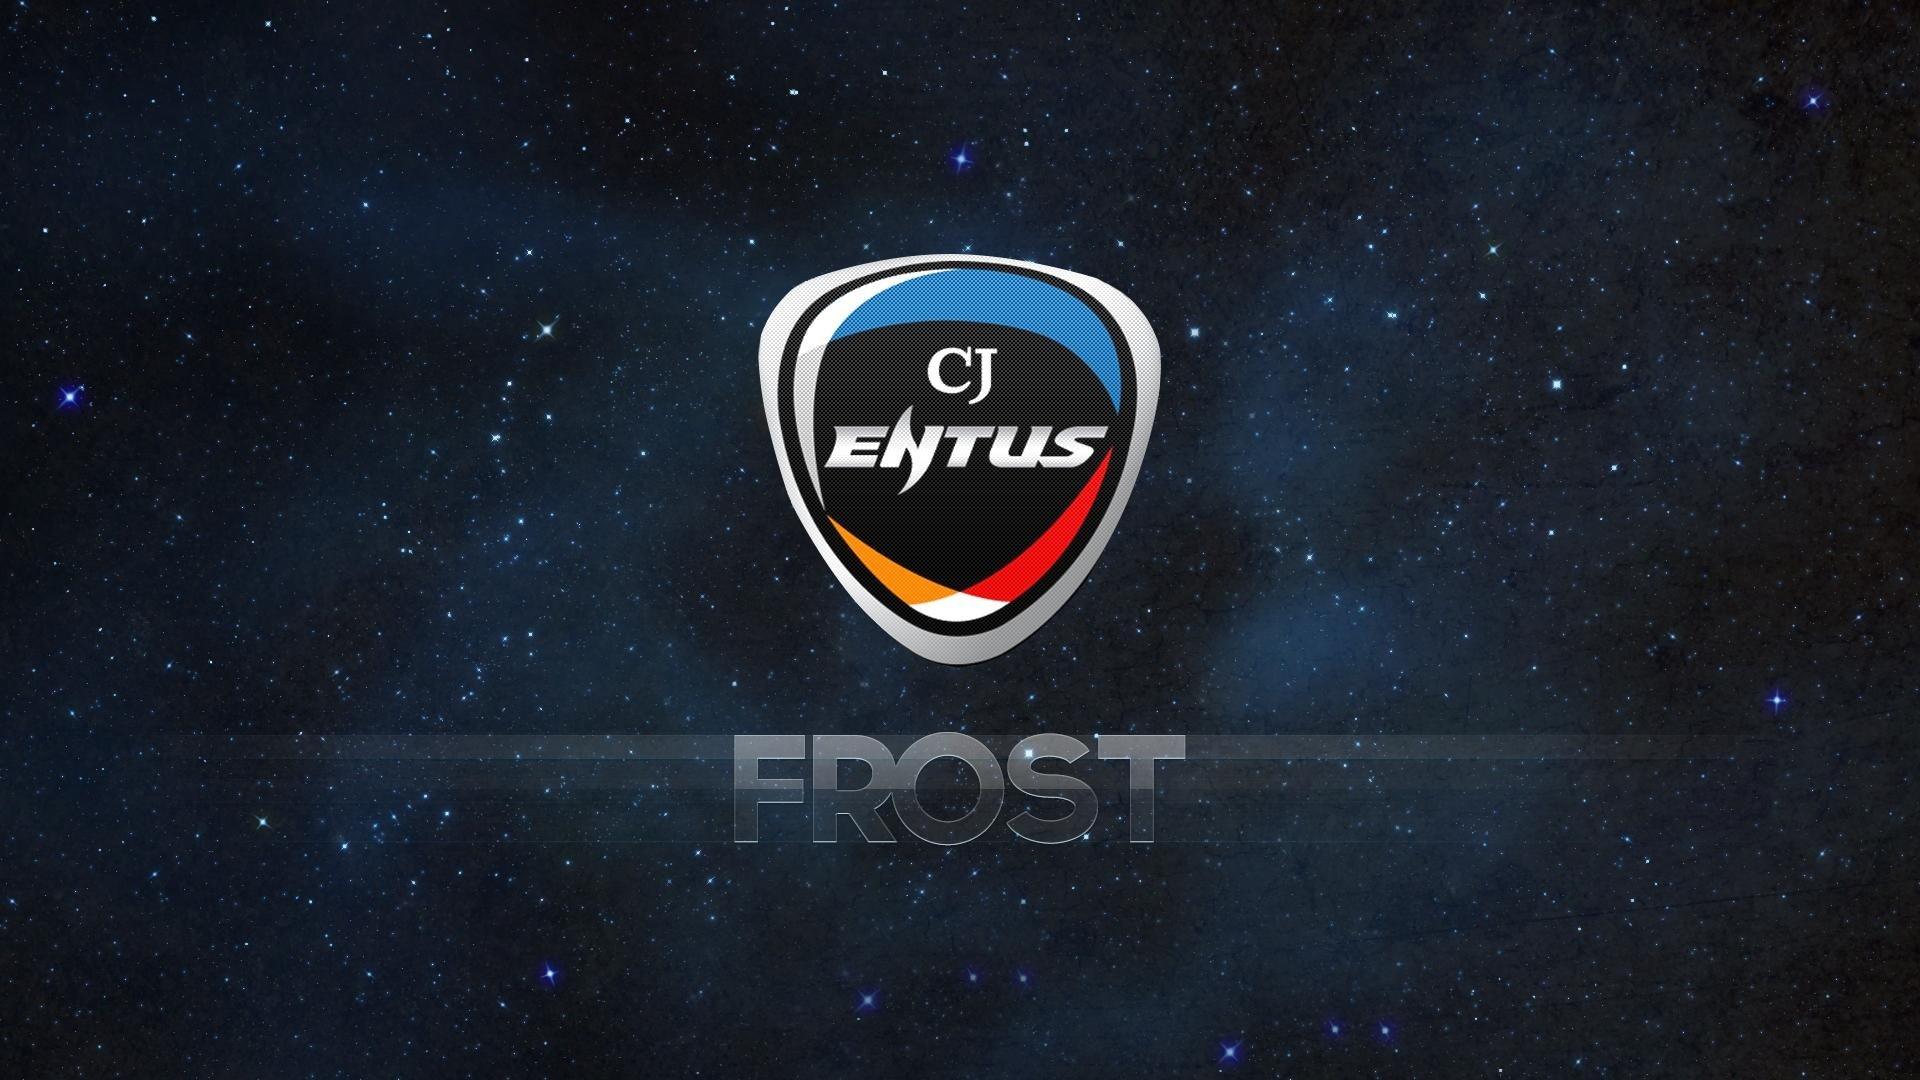 cj_entus_frost